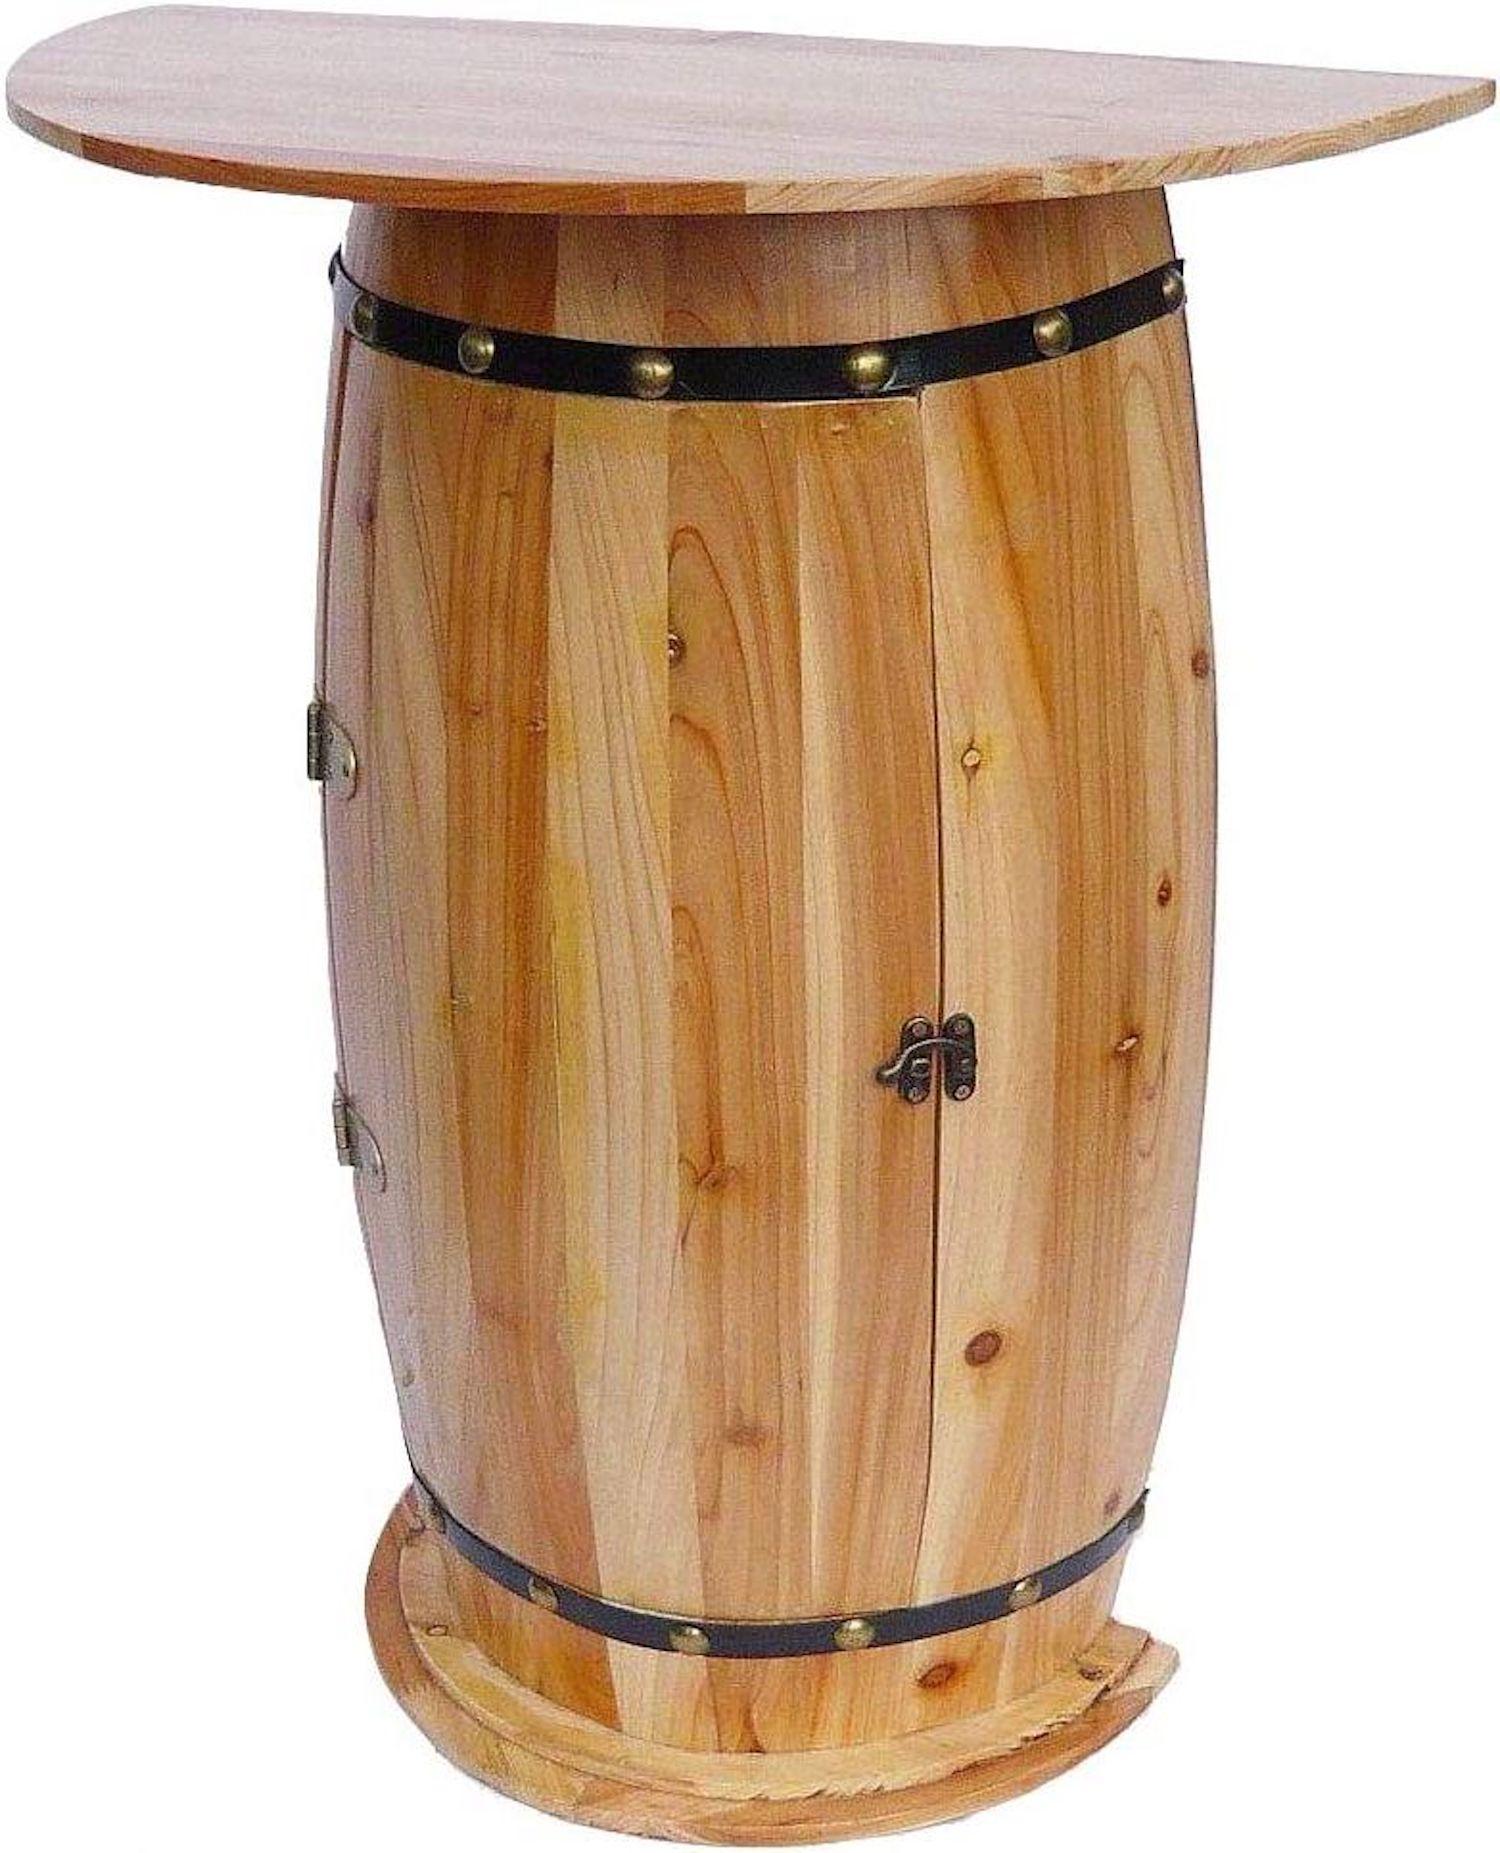 wandtisch tisch weinfass 0373 schrank weinregal fass aus. Black Bedroom Furniture Sets. Home Design Ideas